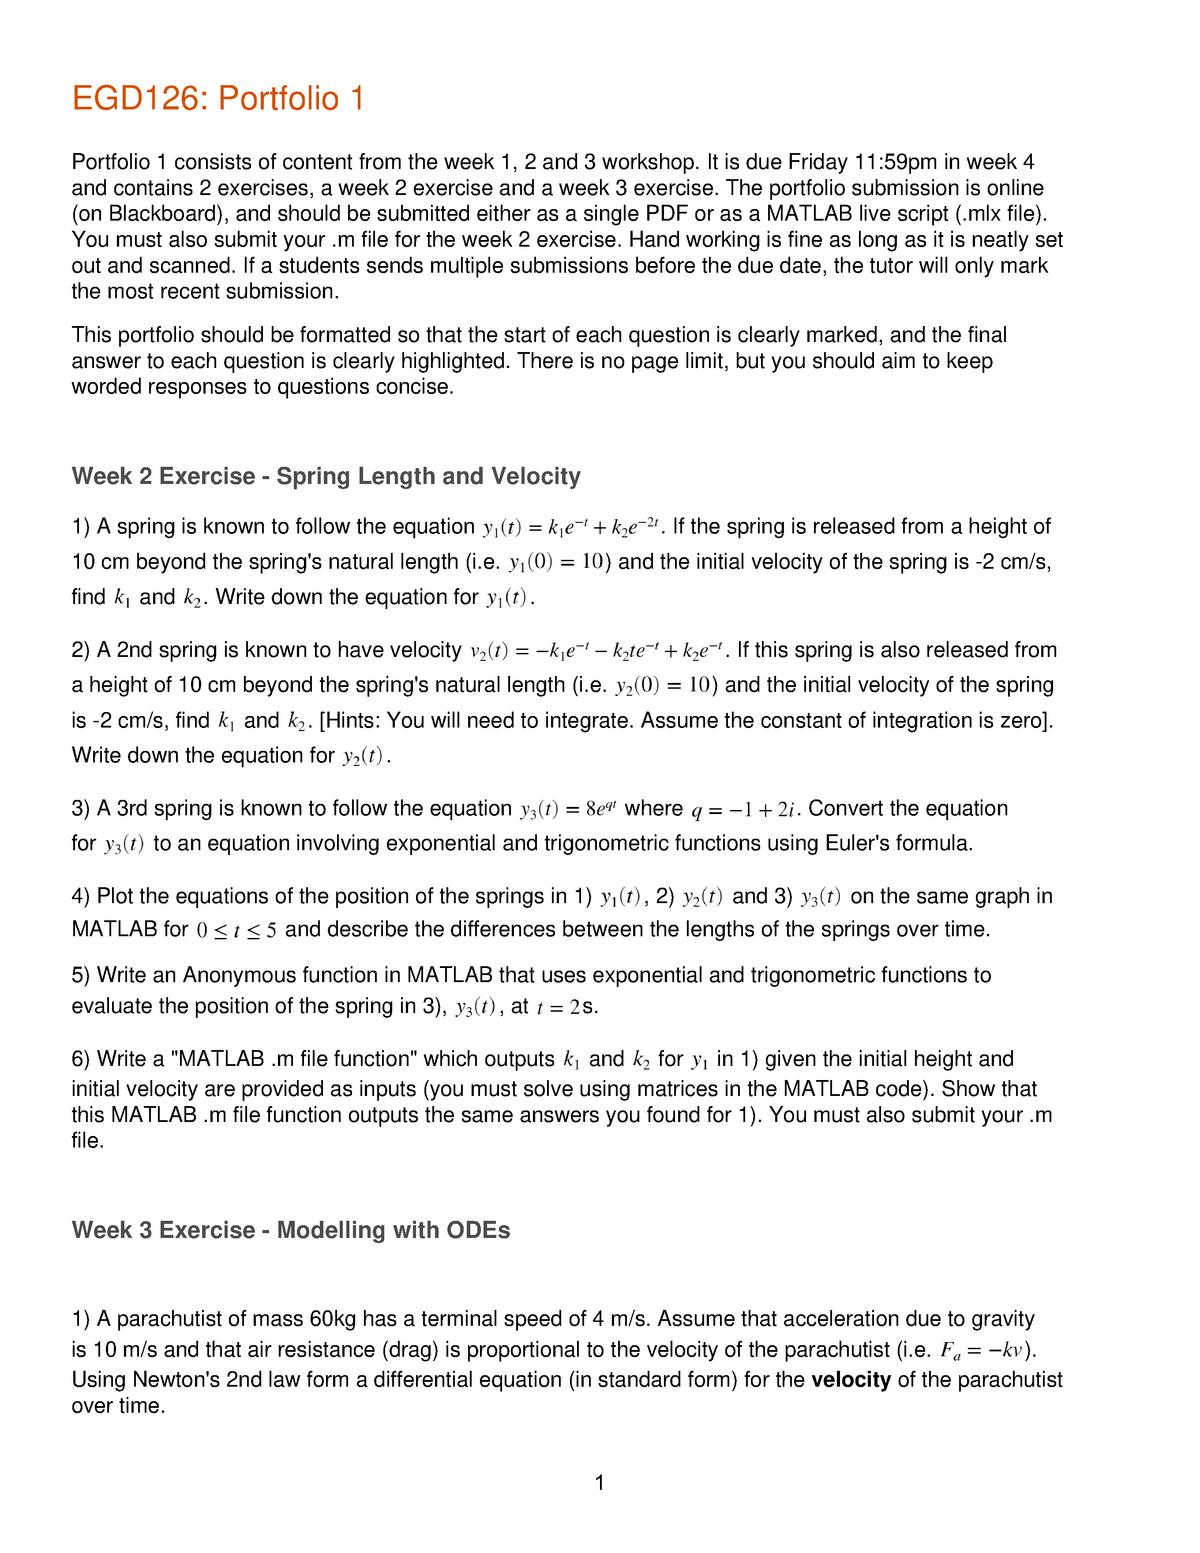 EGD126 Portfolio 1 - good exam for EGD 126 - BSD119: Global